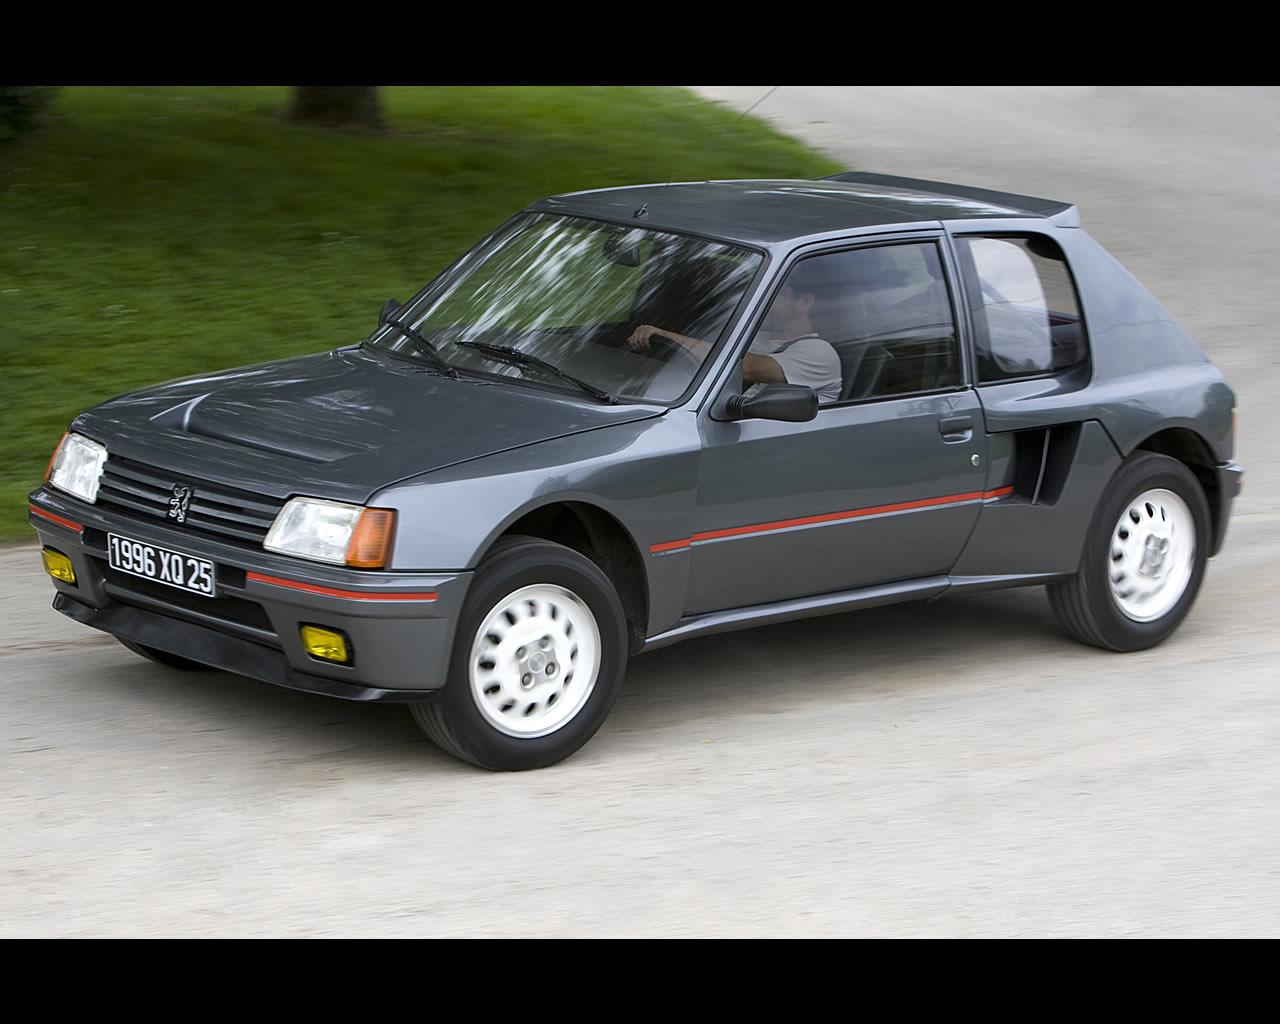 peugeot 205 turbo 16 world rally champion 1985 1986 paris dakar winner 1987 1988 2nd. Black Bedroom Furniture Sets. Home Design Ideas